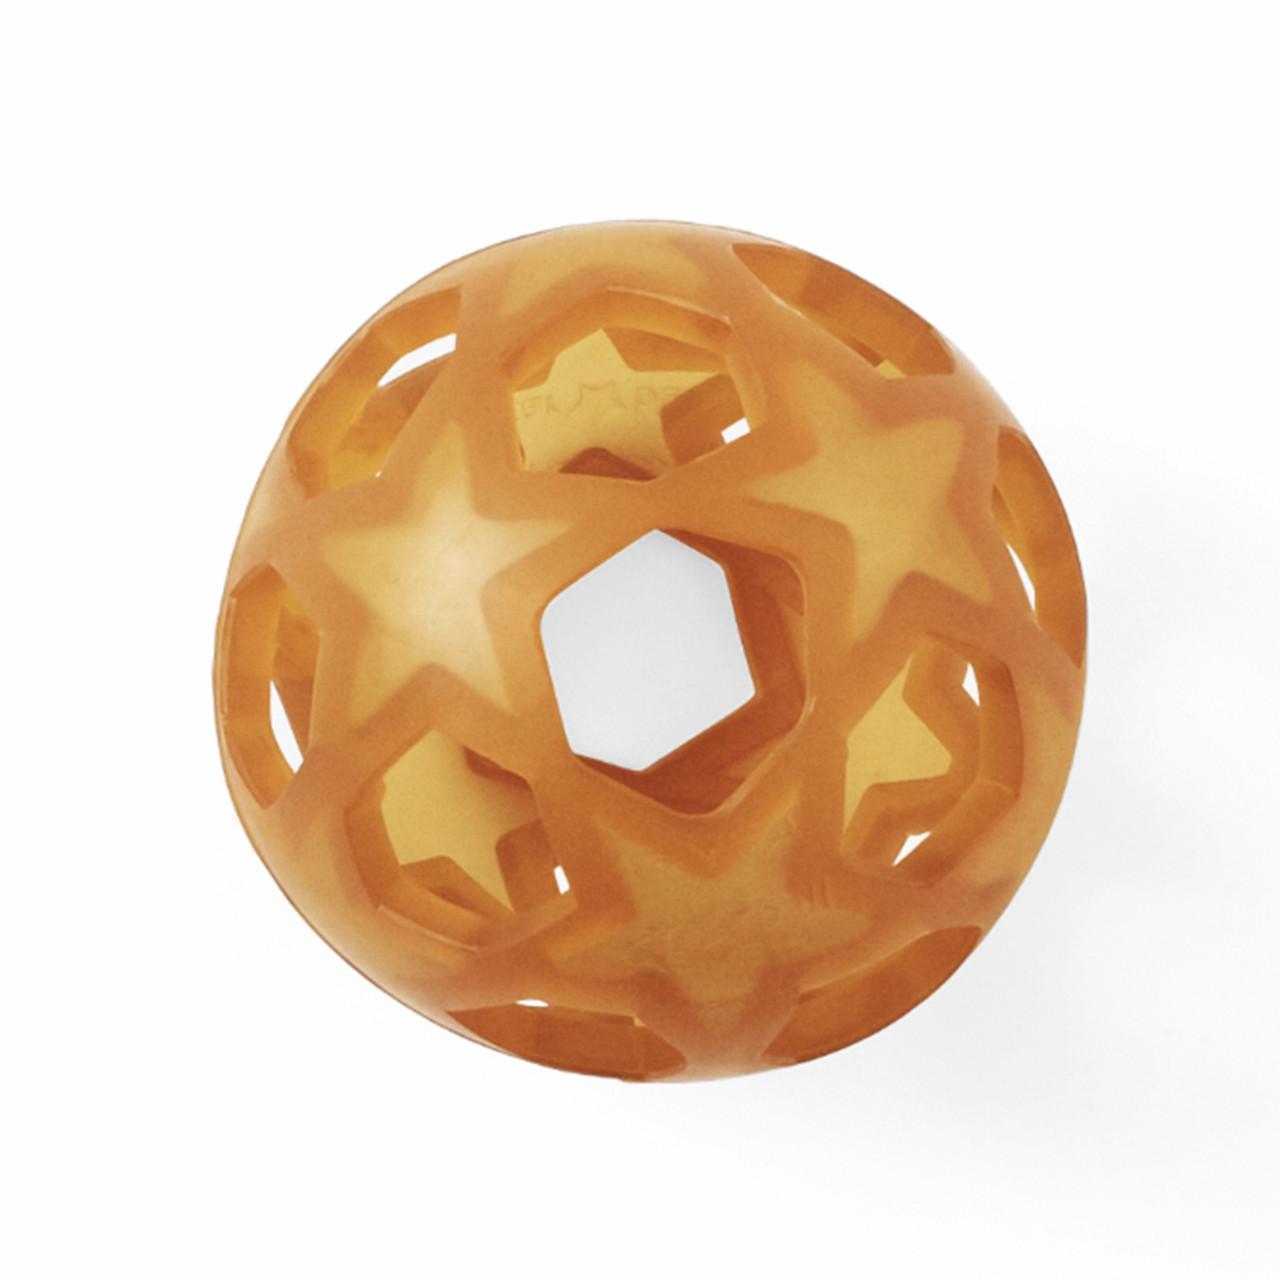 HEVEA - Игрушка-прорезыватель Star Ball Natural